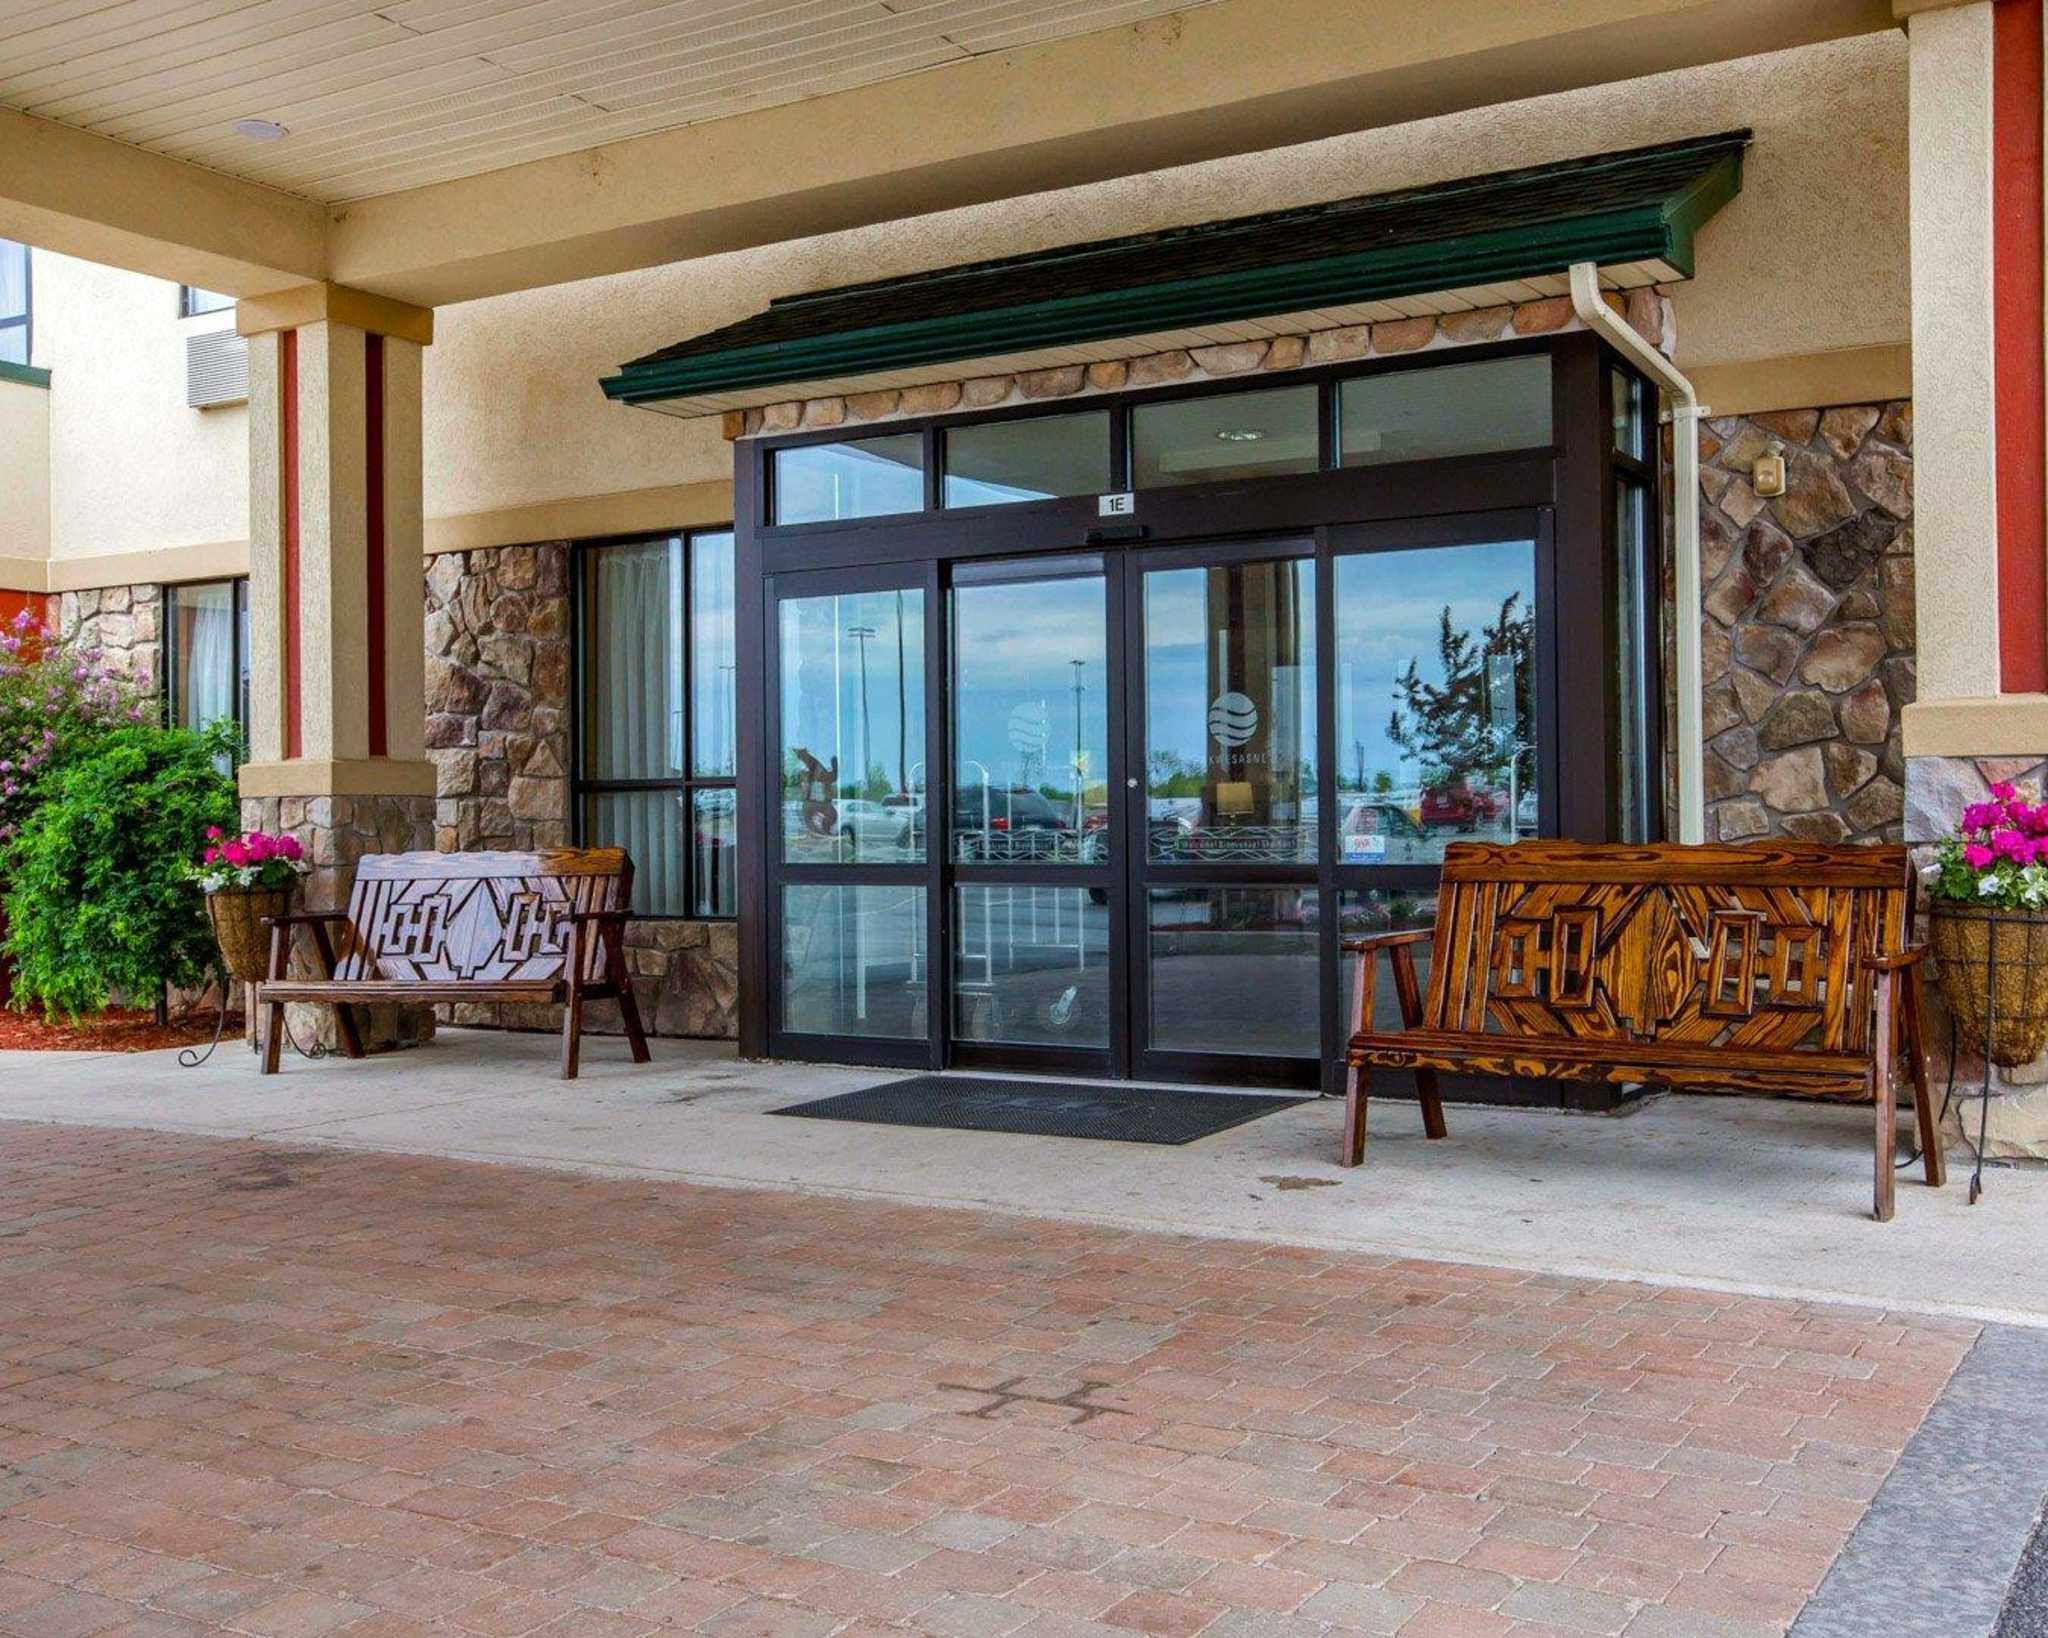 Comfort Inn & Suites adj to Akwesasne Mohawk Casino image 2